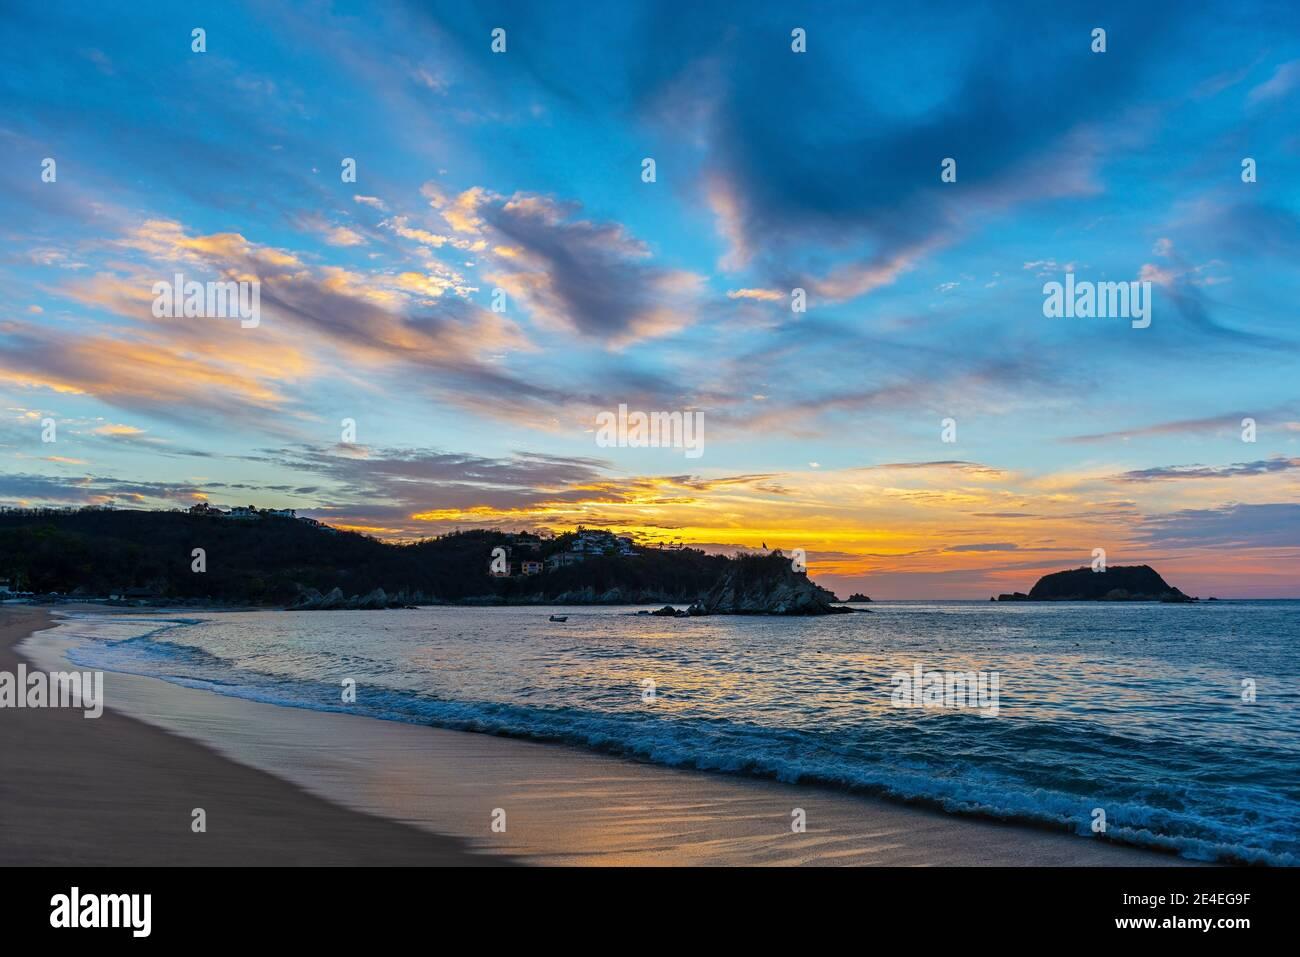 Playa Tangolunda al amanecer, Huatulco, México. Foto de stock